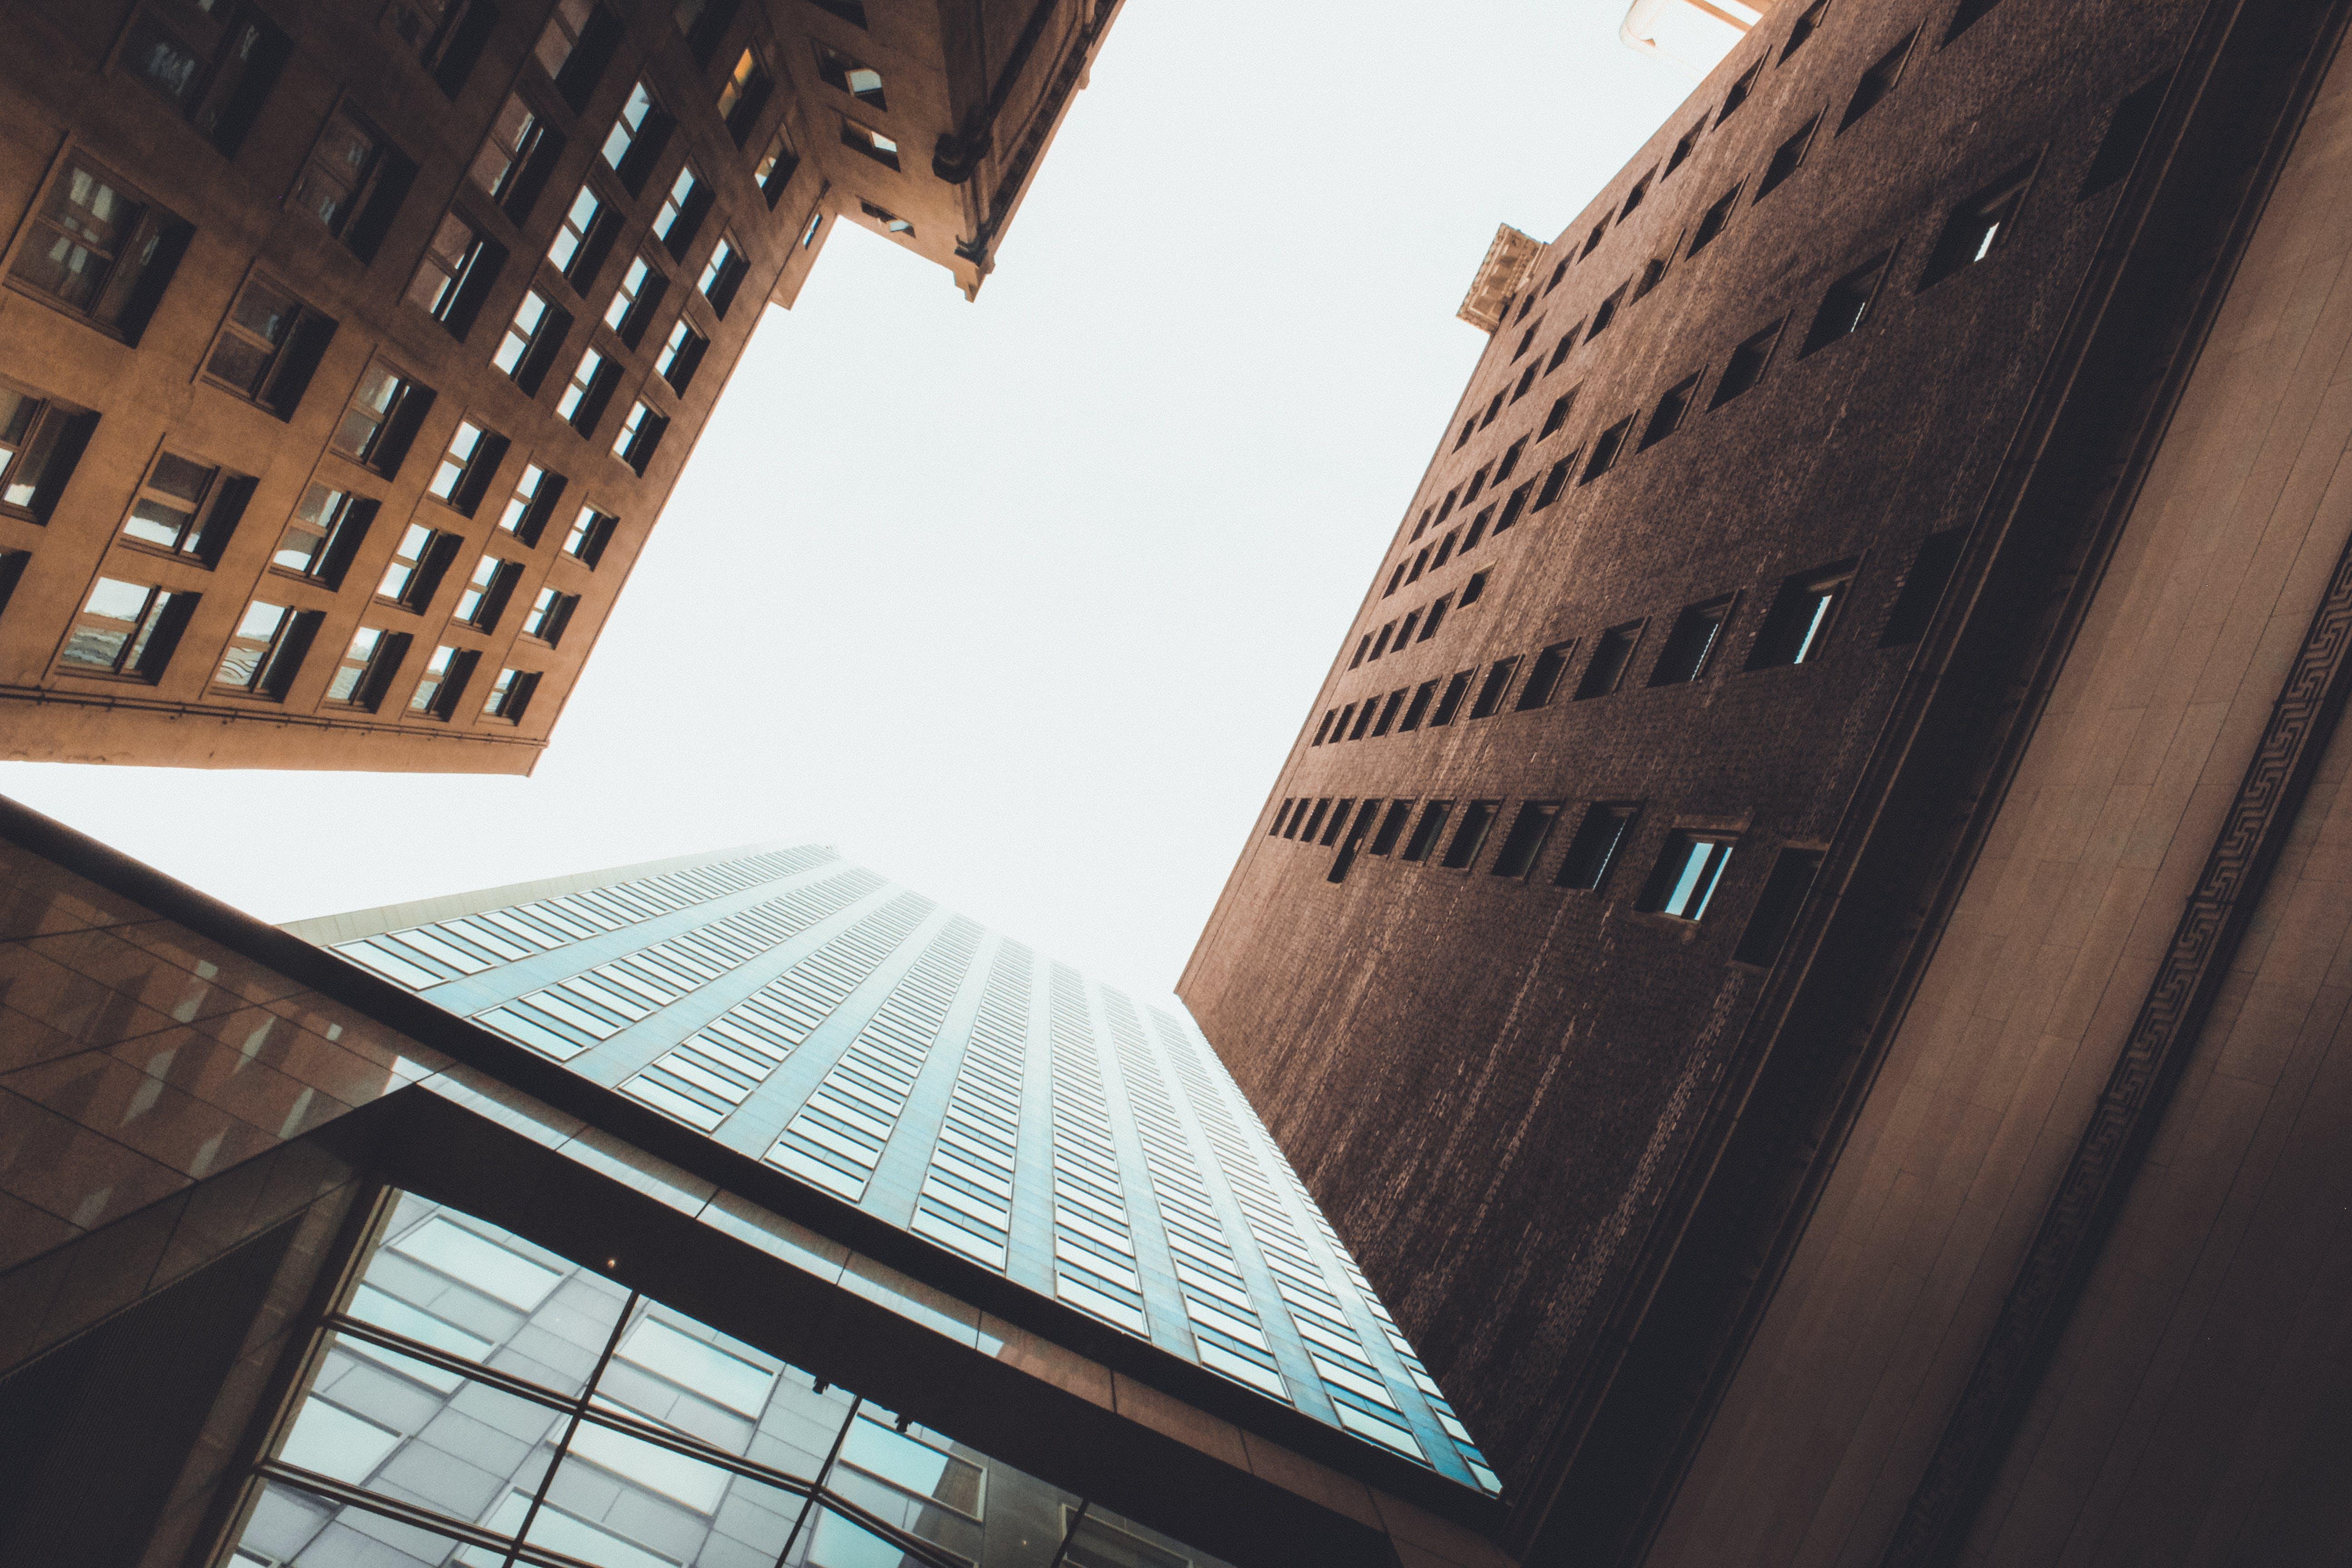 Three High-rise Buildings